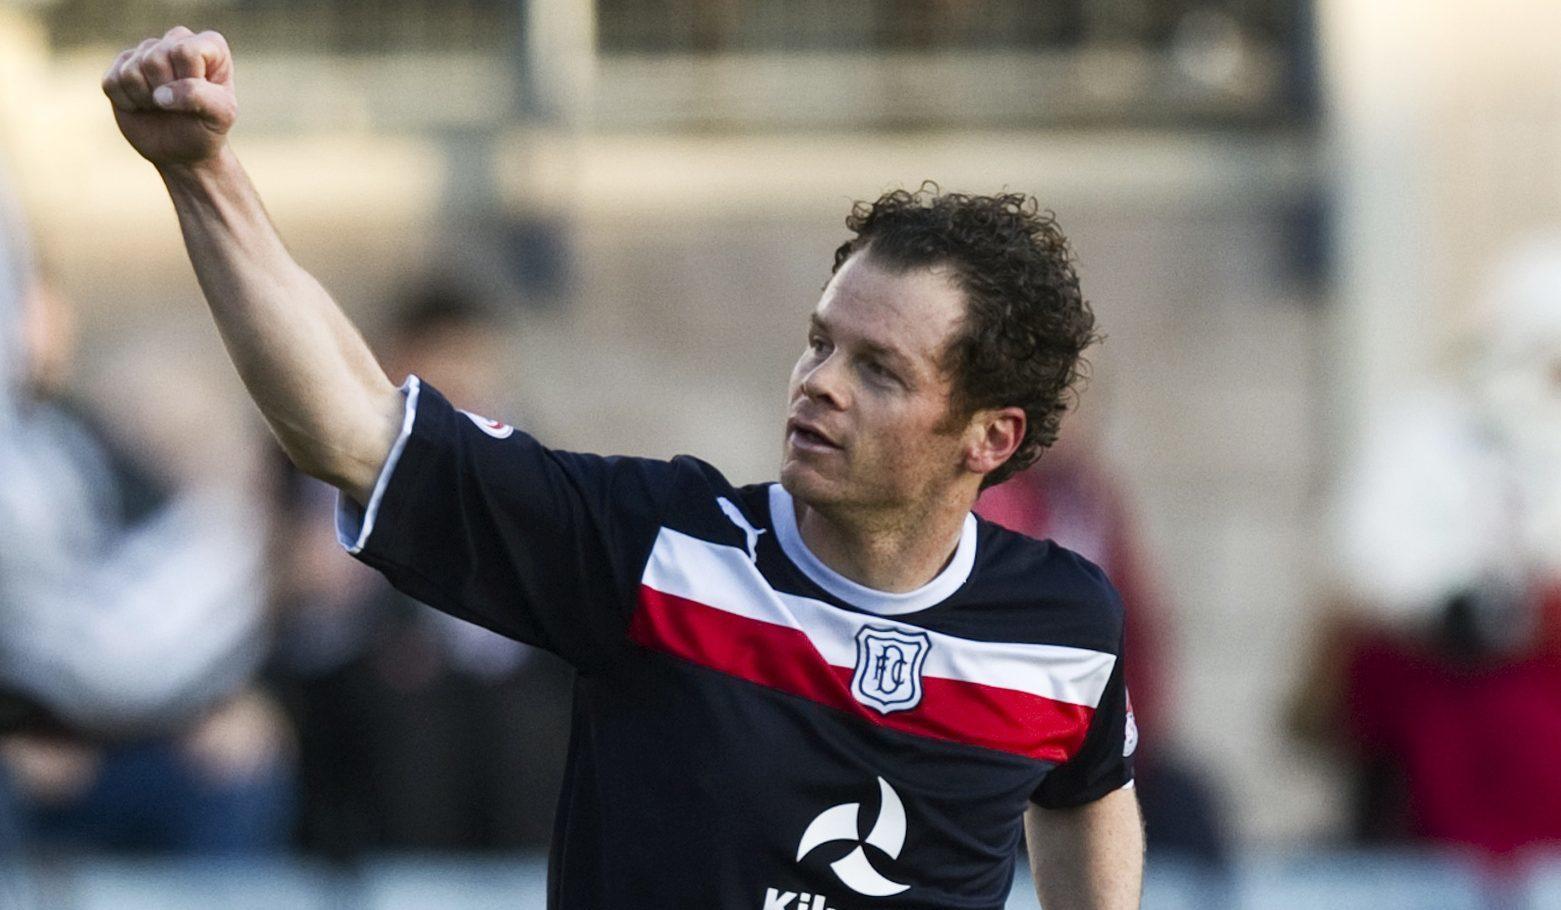 Matt Lockwood appearing for Dundee in 2012.